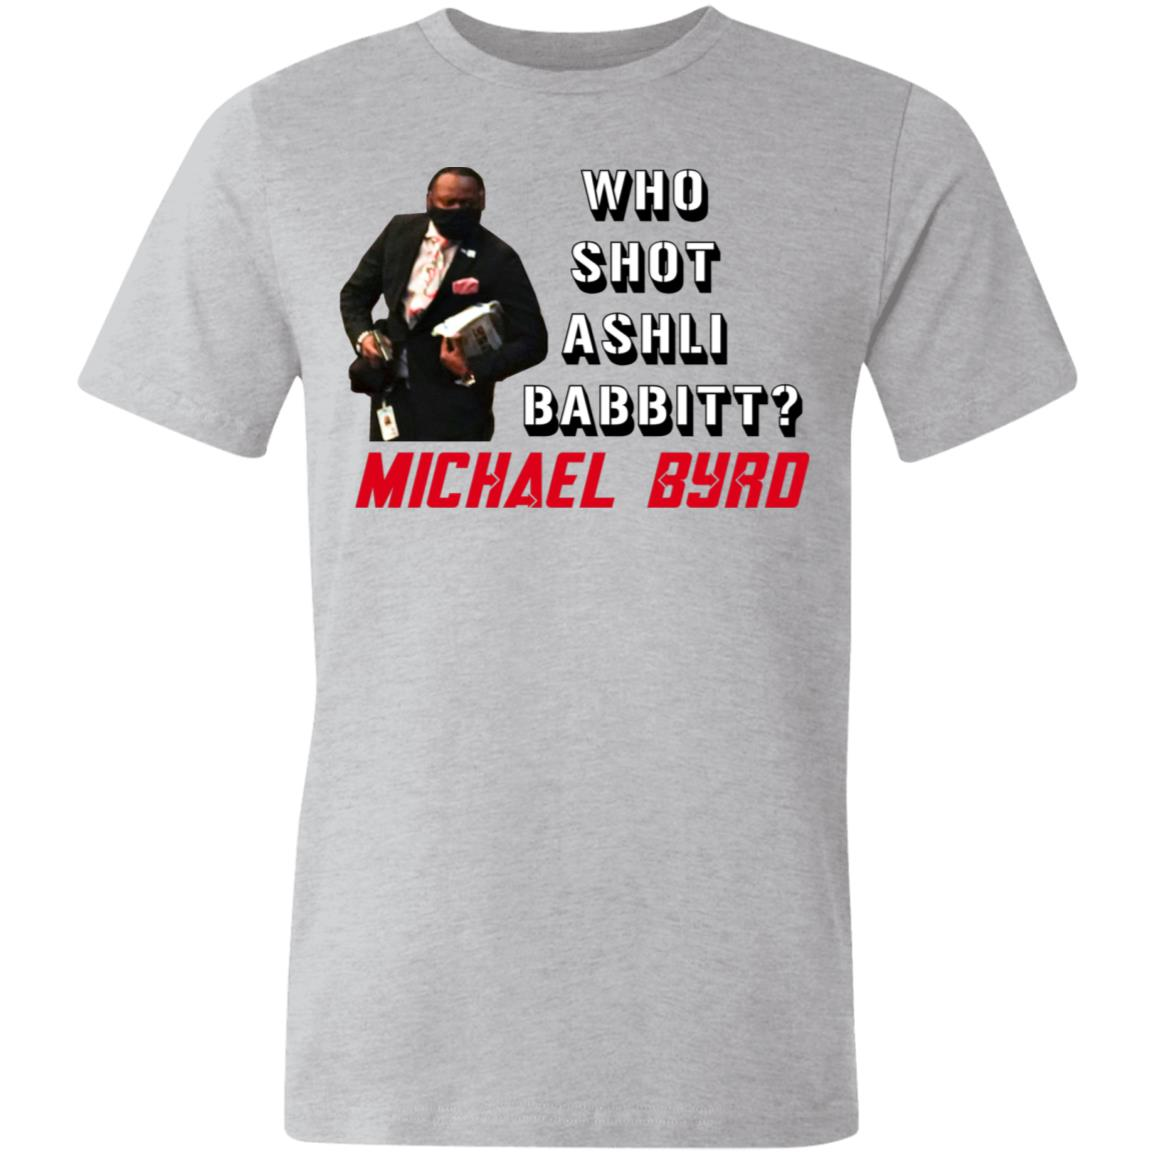 Who Shot Ashli Babbitt T Shirt (6 Variants)